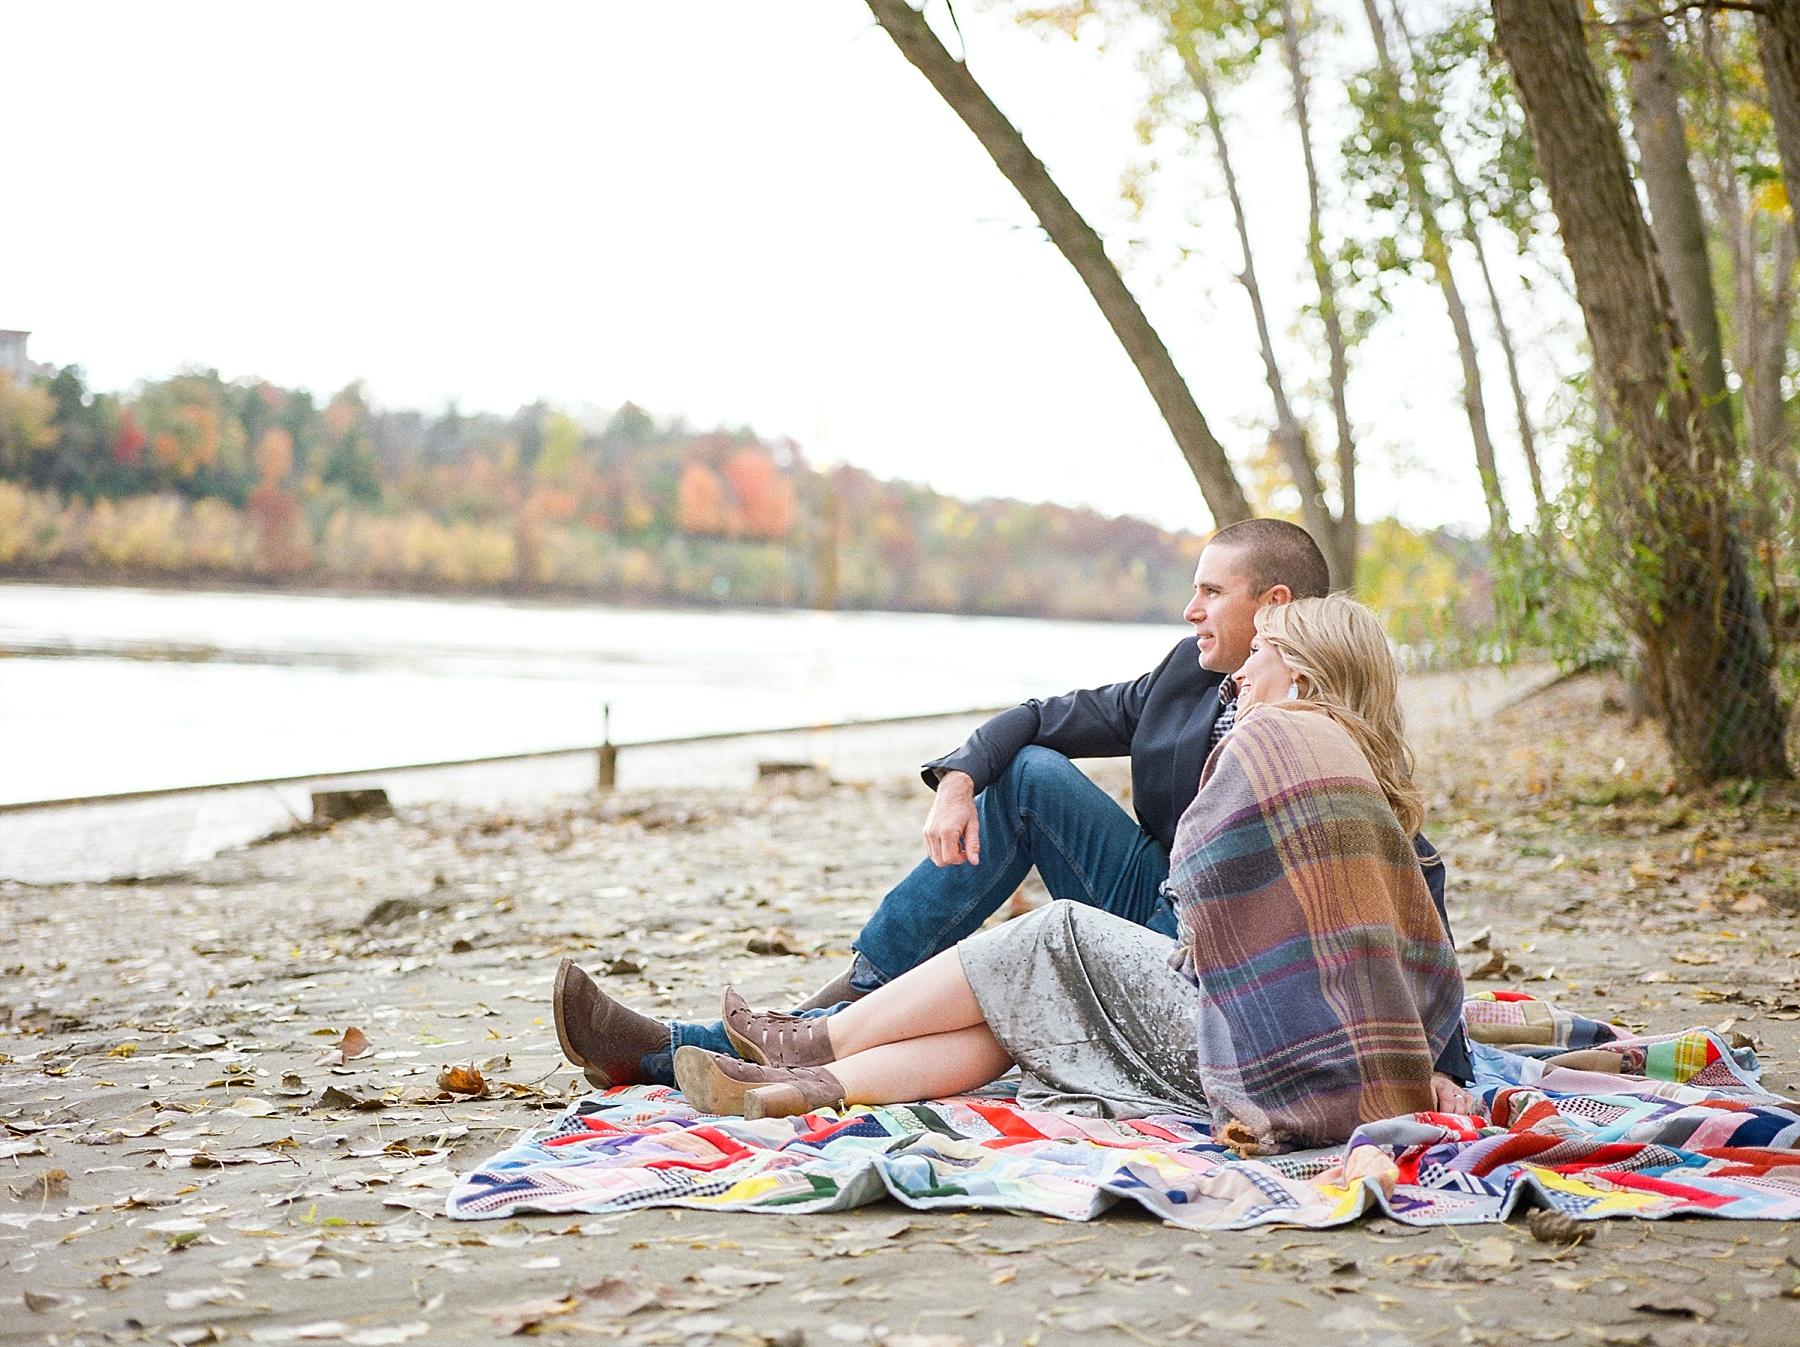 Ten Year Anniversary Session on Shore of Missouri River by Kelsi Kliethermes Photography Kansas City Missouri Wedding Photographer_0003.jpg